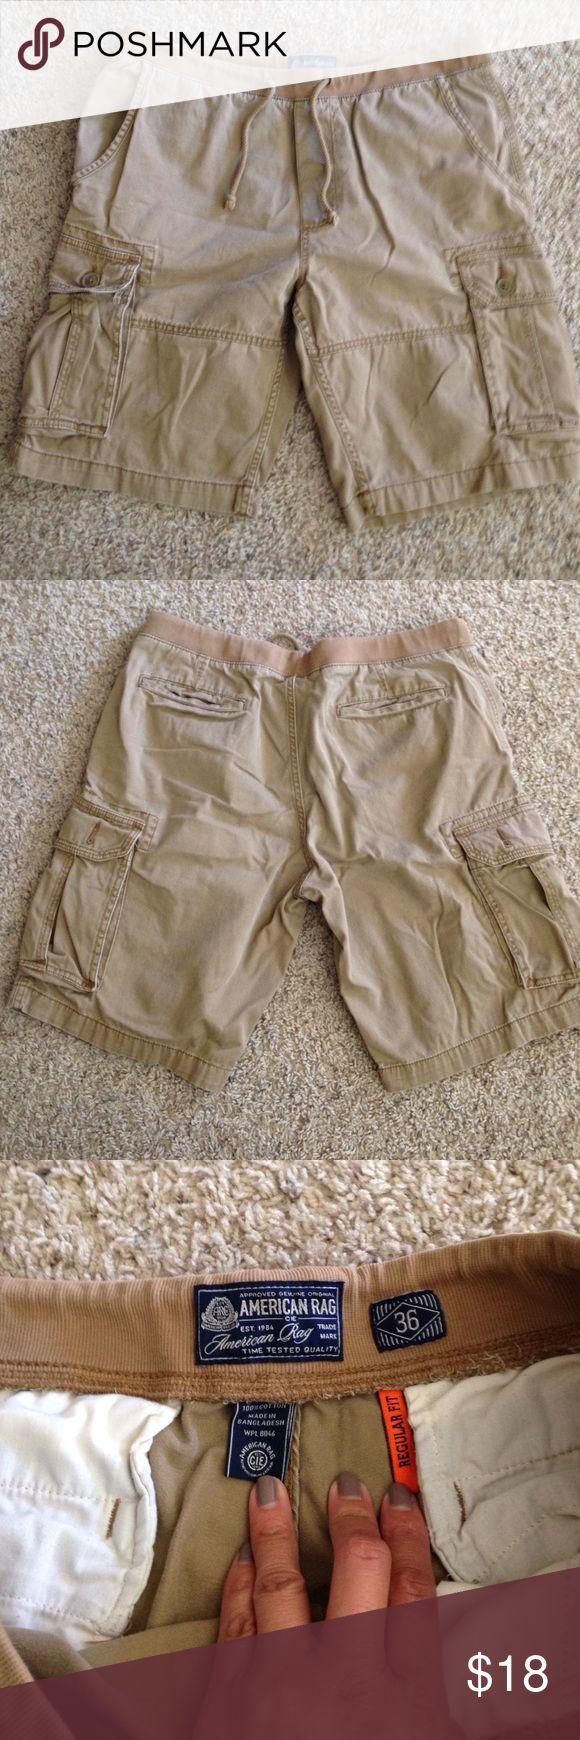 American Rag khaki cargo shorts Excellent condition men's American Rag cargo shorts. Tie waist. No holes or stains. Size 36 American Rag Shorts Cargo